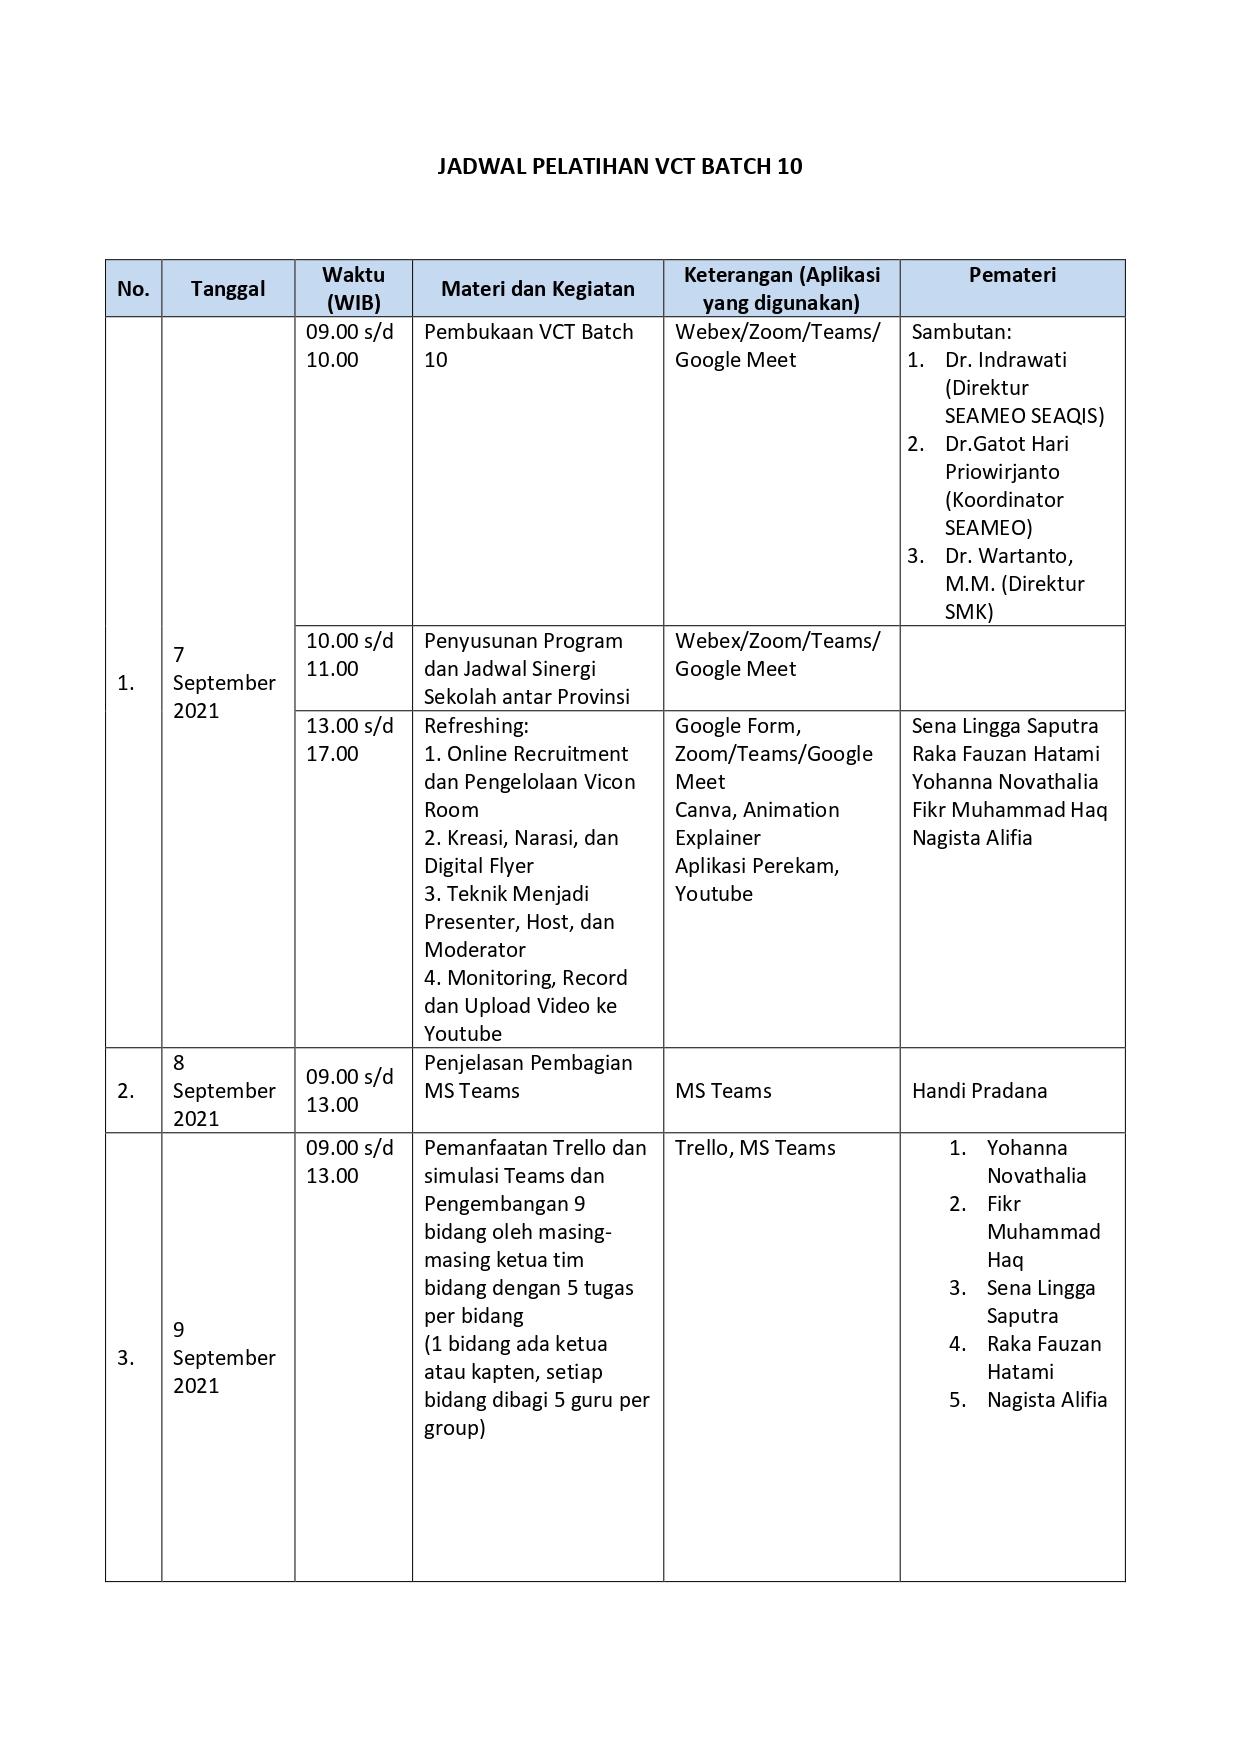 Jadwal Kegiatan VCT Batch 10